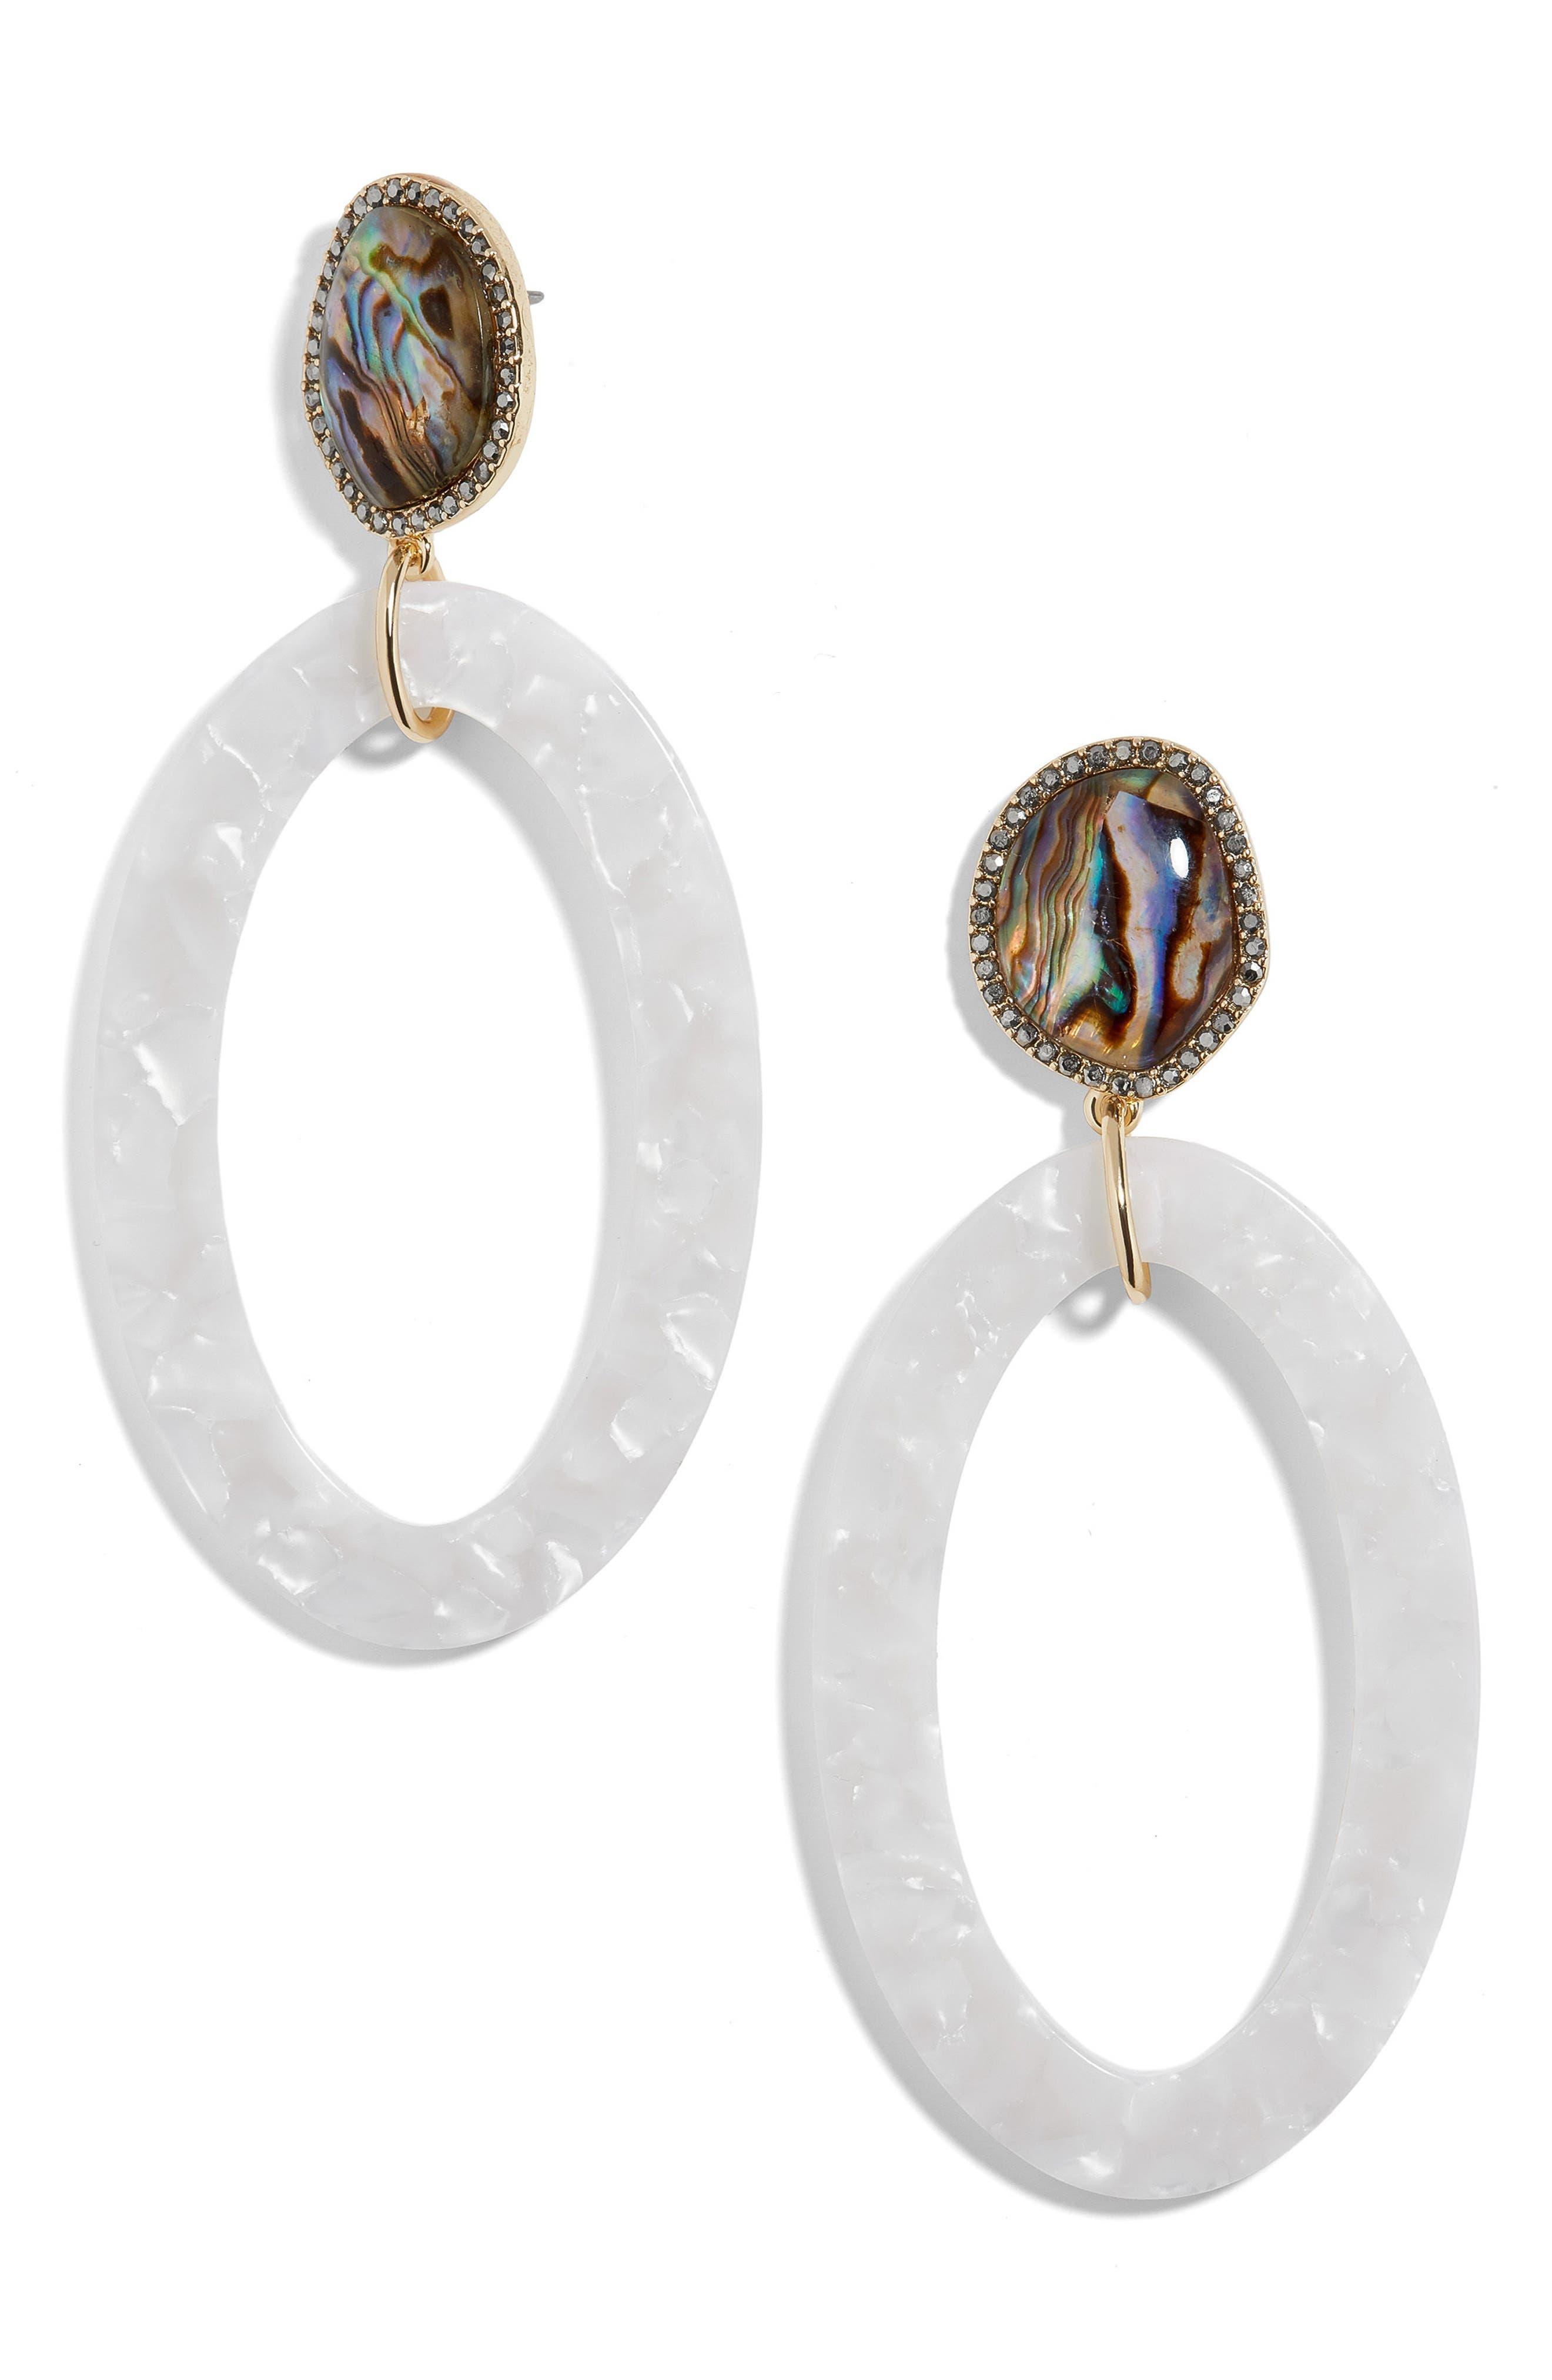 Trisha Drusy & Oval Drop Earrings,                             Main thumbnail 1, color,                             Navy